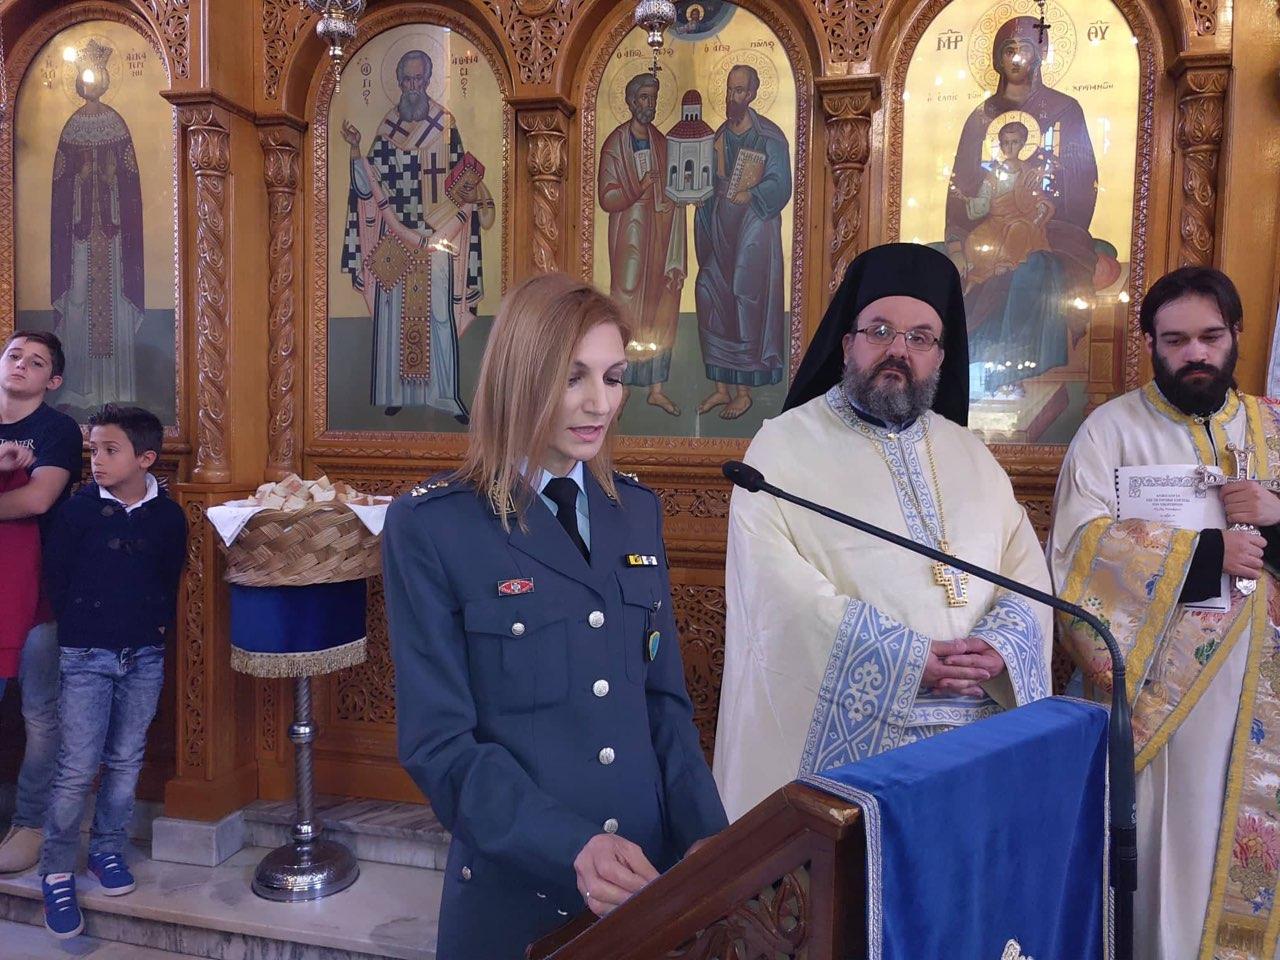 doksologia AgArtemiou 5 - Εορτή του Αγίου Αρτεμίου και της Ελληνικής Αστυνομίας